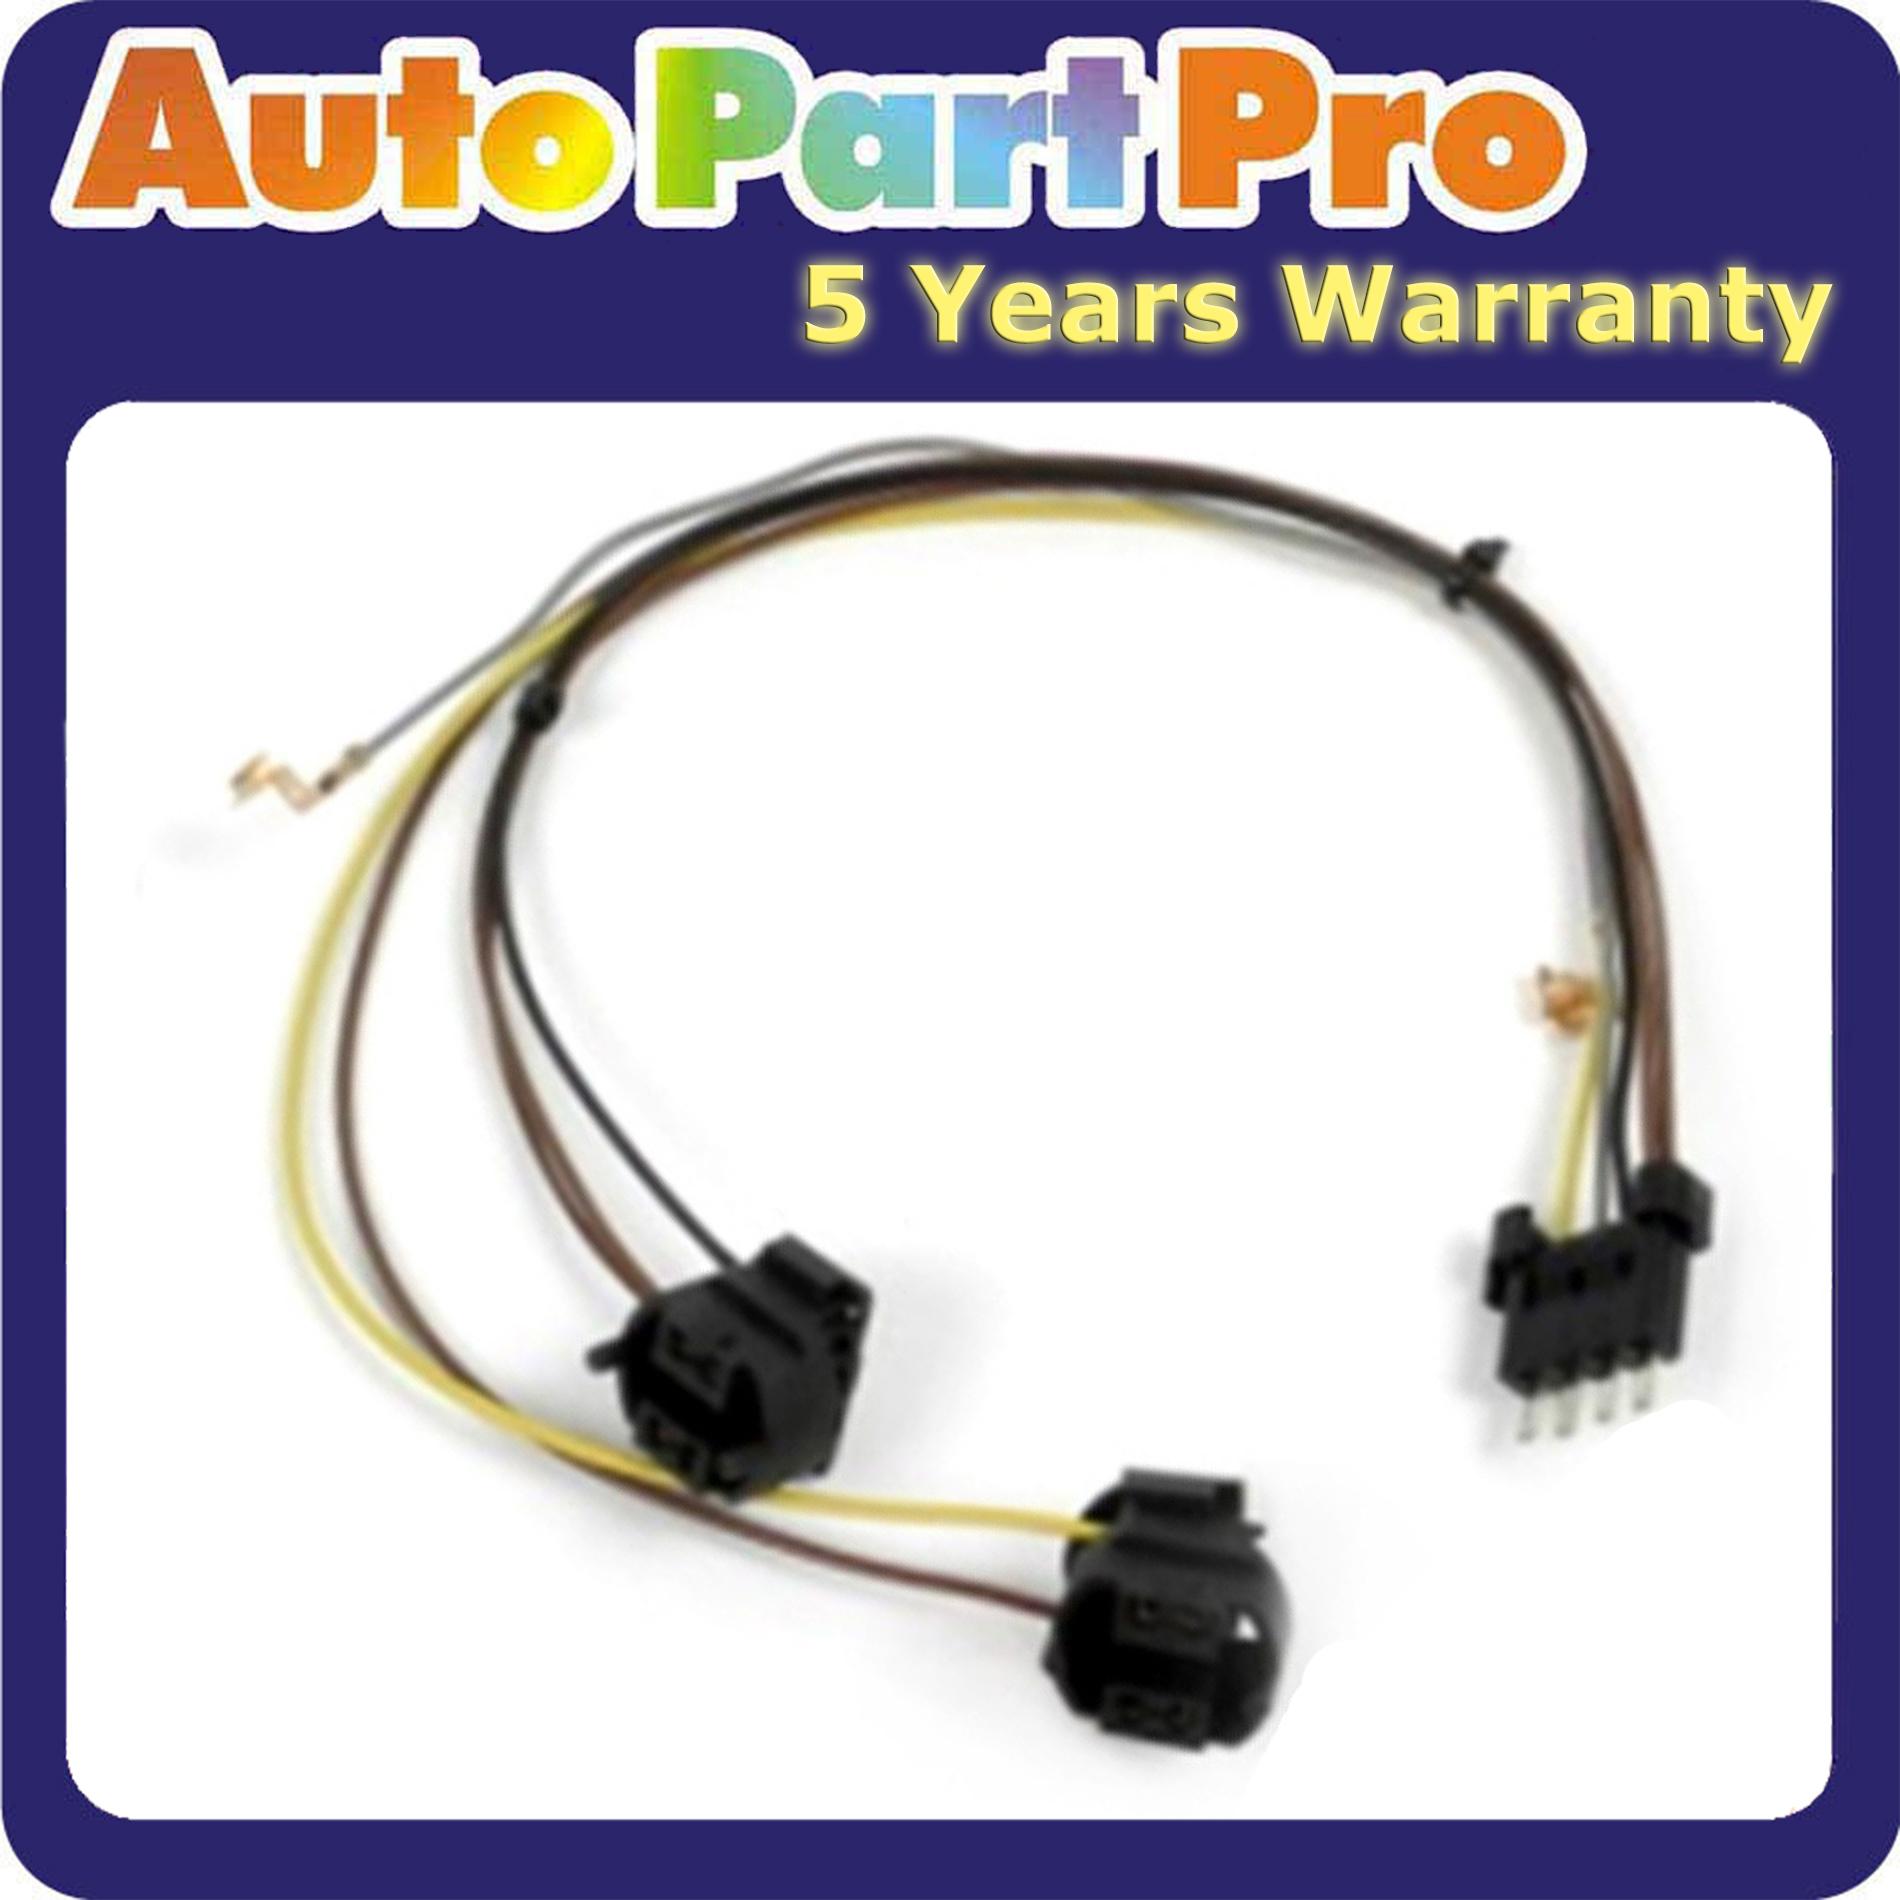 Headlight Wiring Harness Repair Kits - Wiring Diagrams Dash